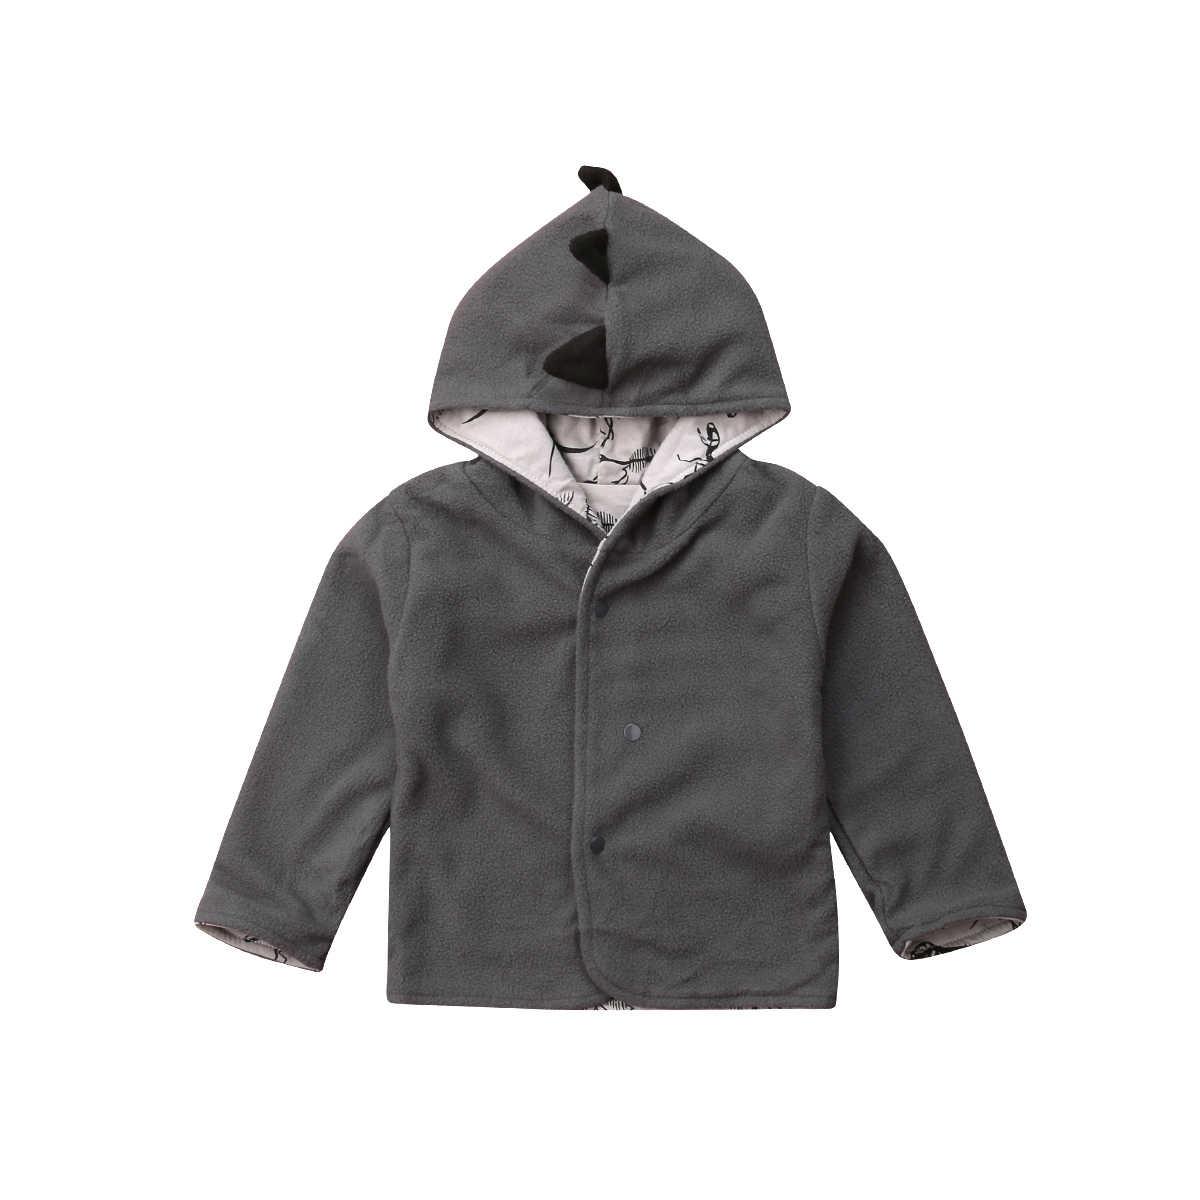 42b483e6b Baby Boys Velvet Blazer Toddler Kids Winter Jacket Coat Warm Thick Clothing  Outerwear